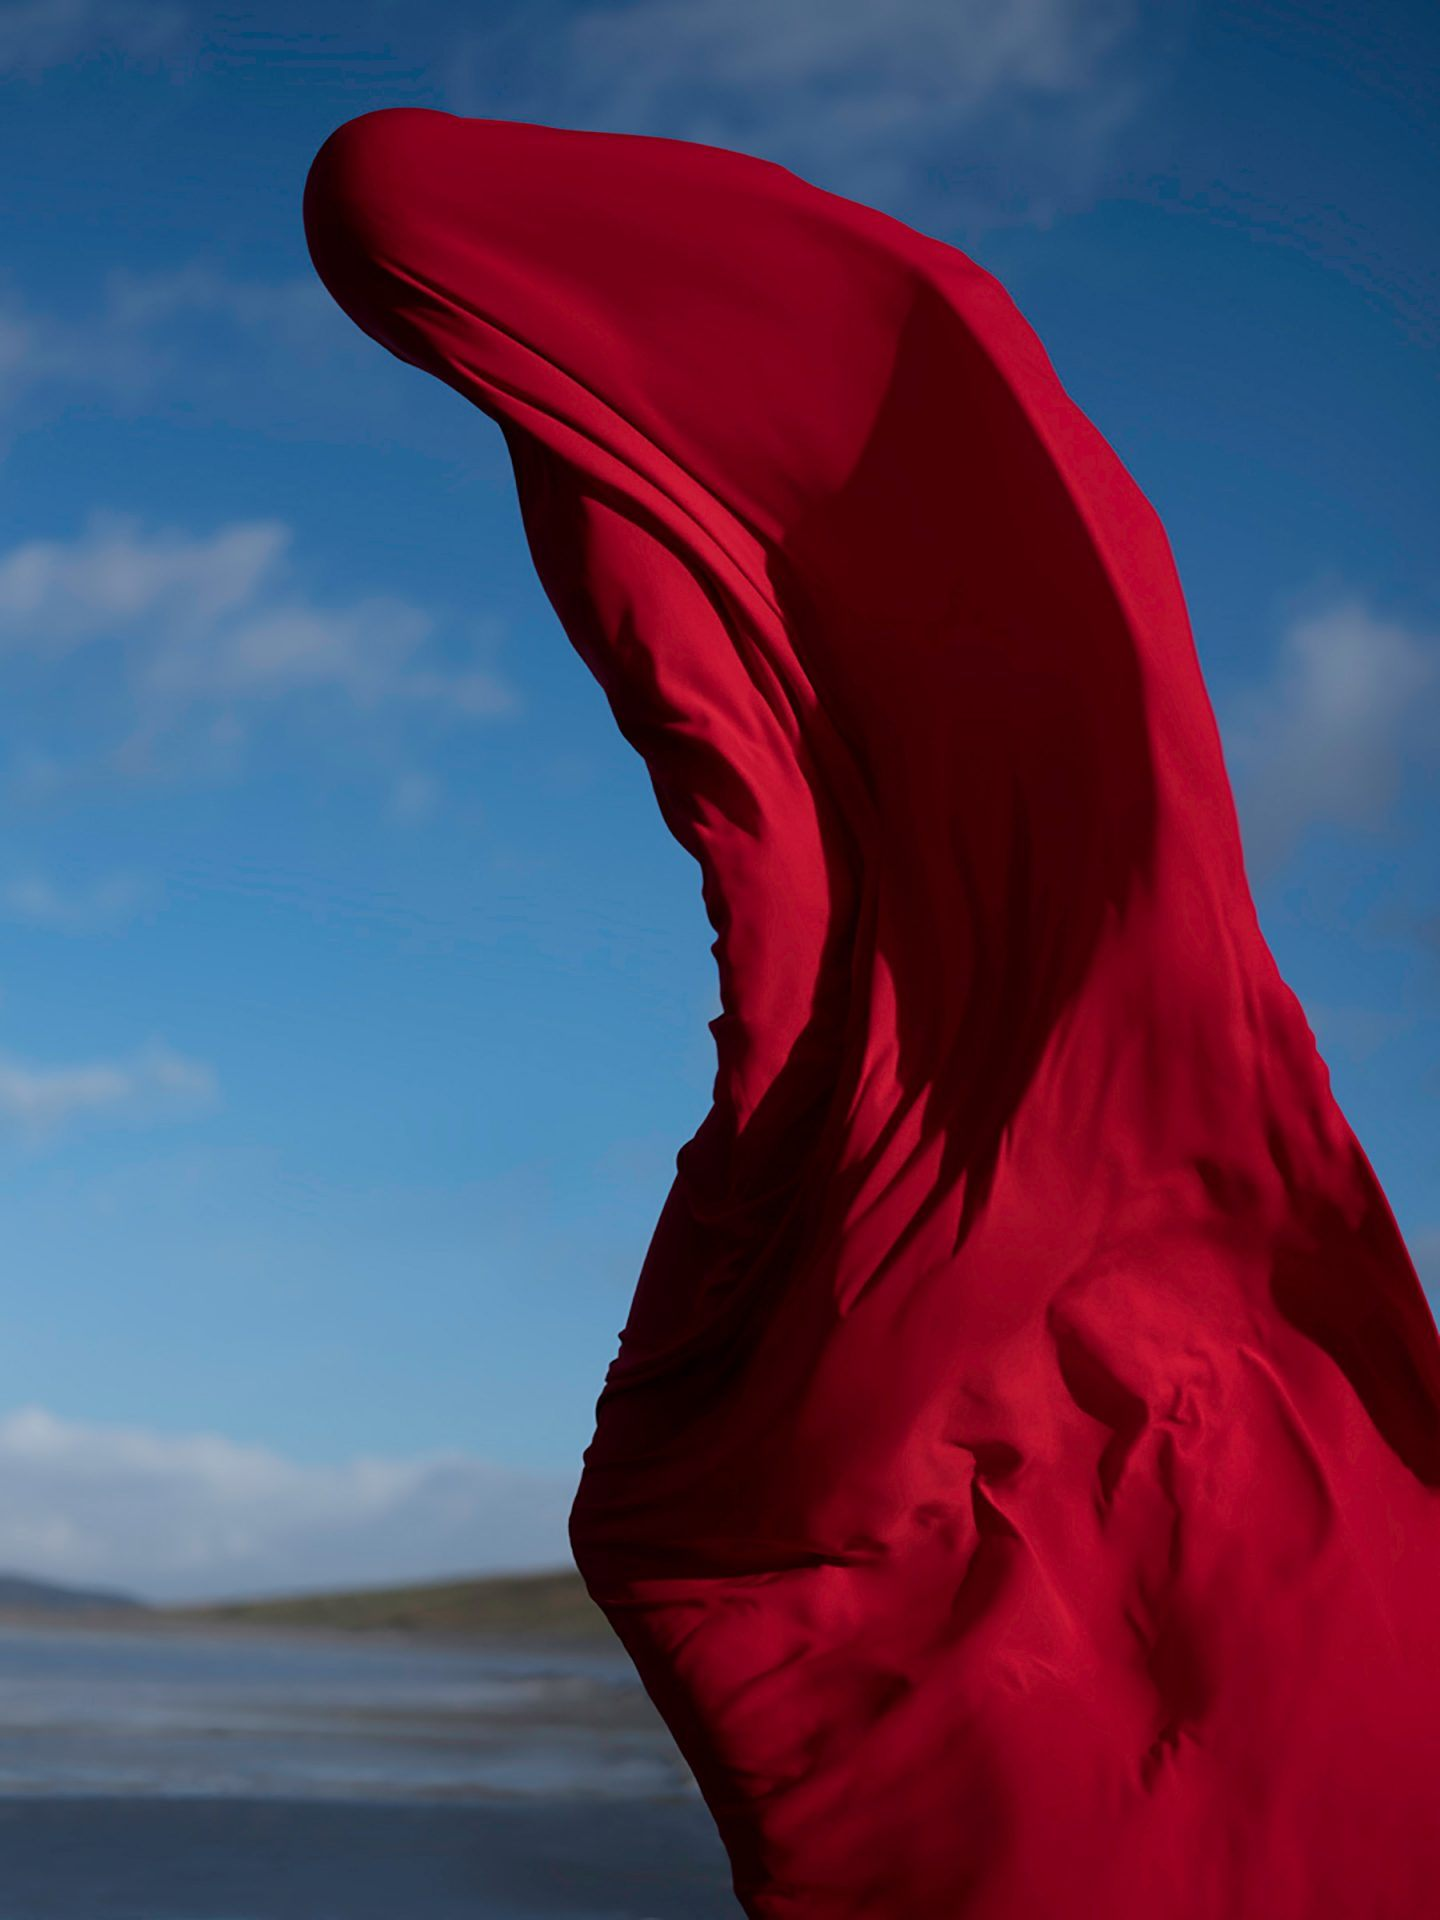 IGNANT-Photography-Eamonn-Doyle-K-9